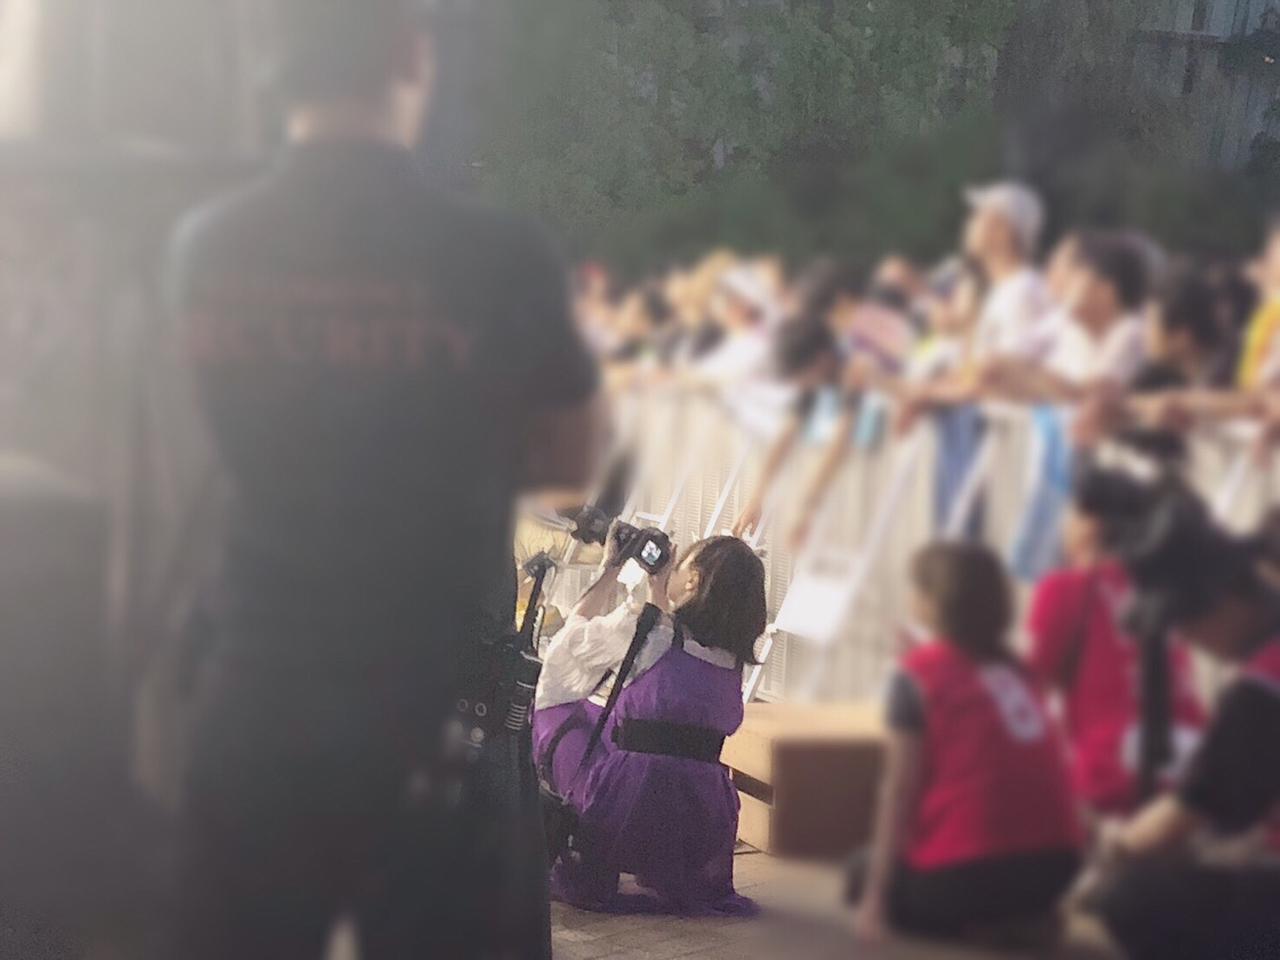 TIFでカメラマンさんに紛れてさなつんの歌う姿を撮る野口カメラマン✨